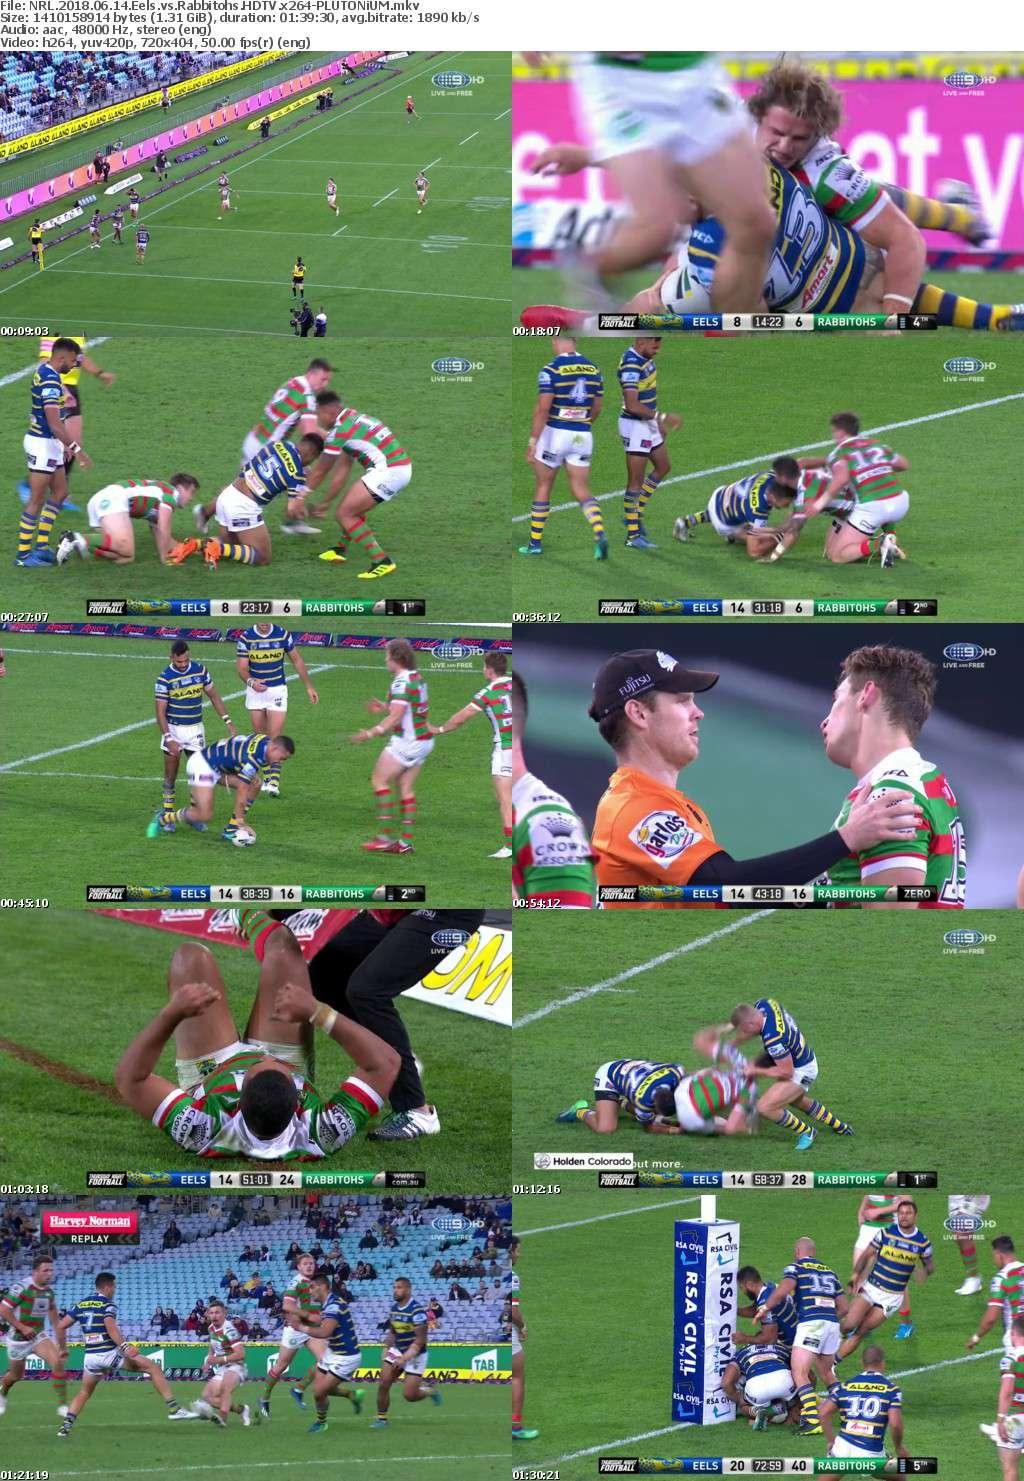 NRL 2018 06 14 Eels vs Rabbitohs HDTV x264-PLUTONiUM